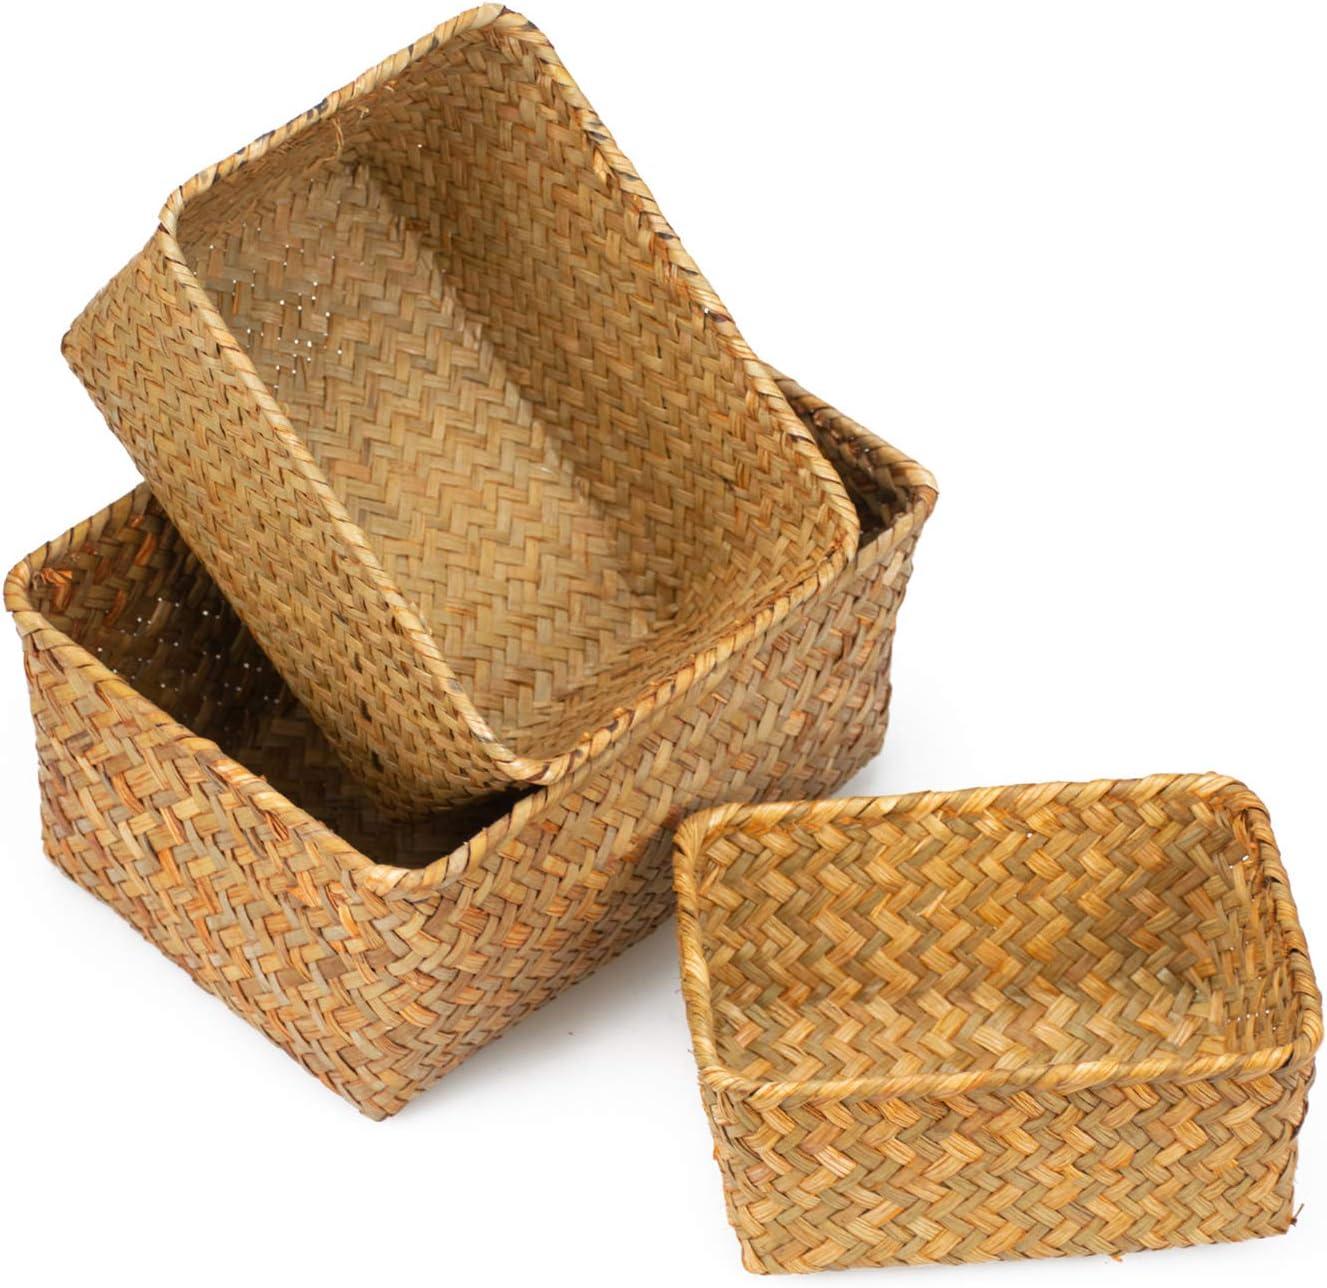 Yesland Seagrass Storage Basket, Multisize Handmade Rattan Shelf Baskets & Home Storage Bins Baskets for Decoration, Picnic, Groceries and Toy Storage(Set of 3)